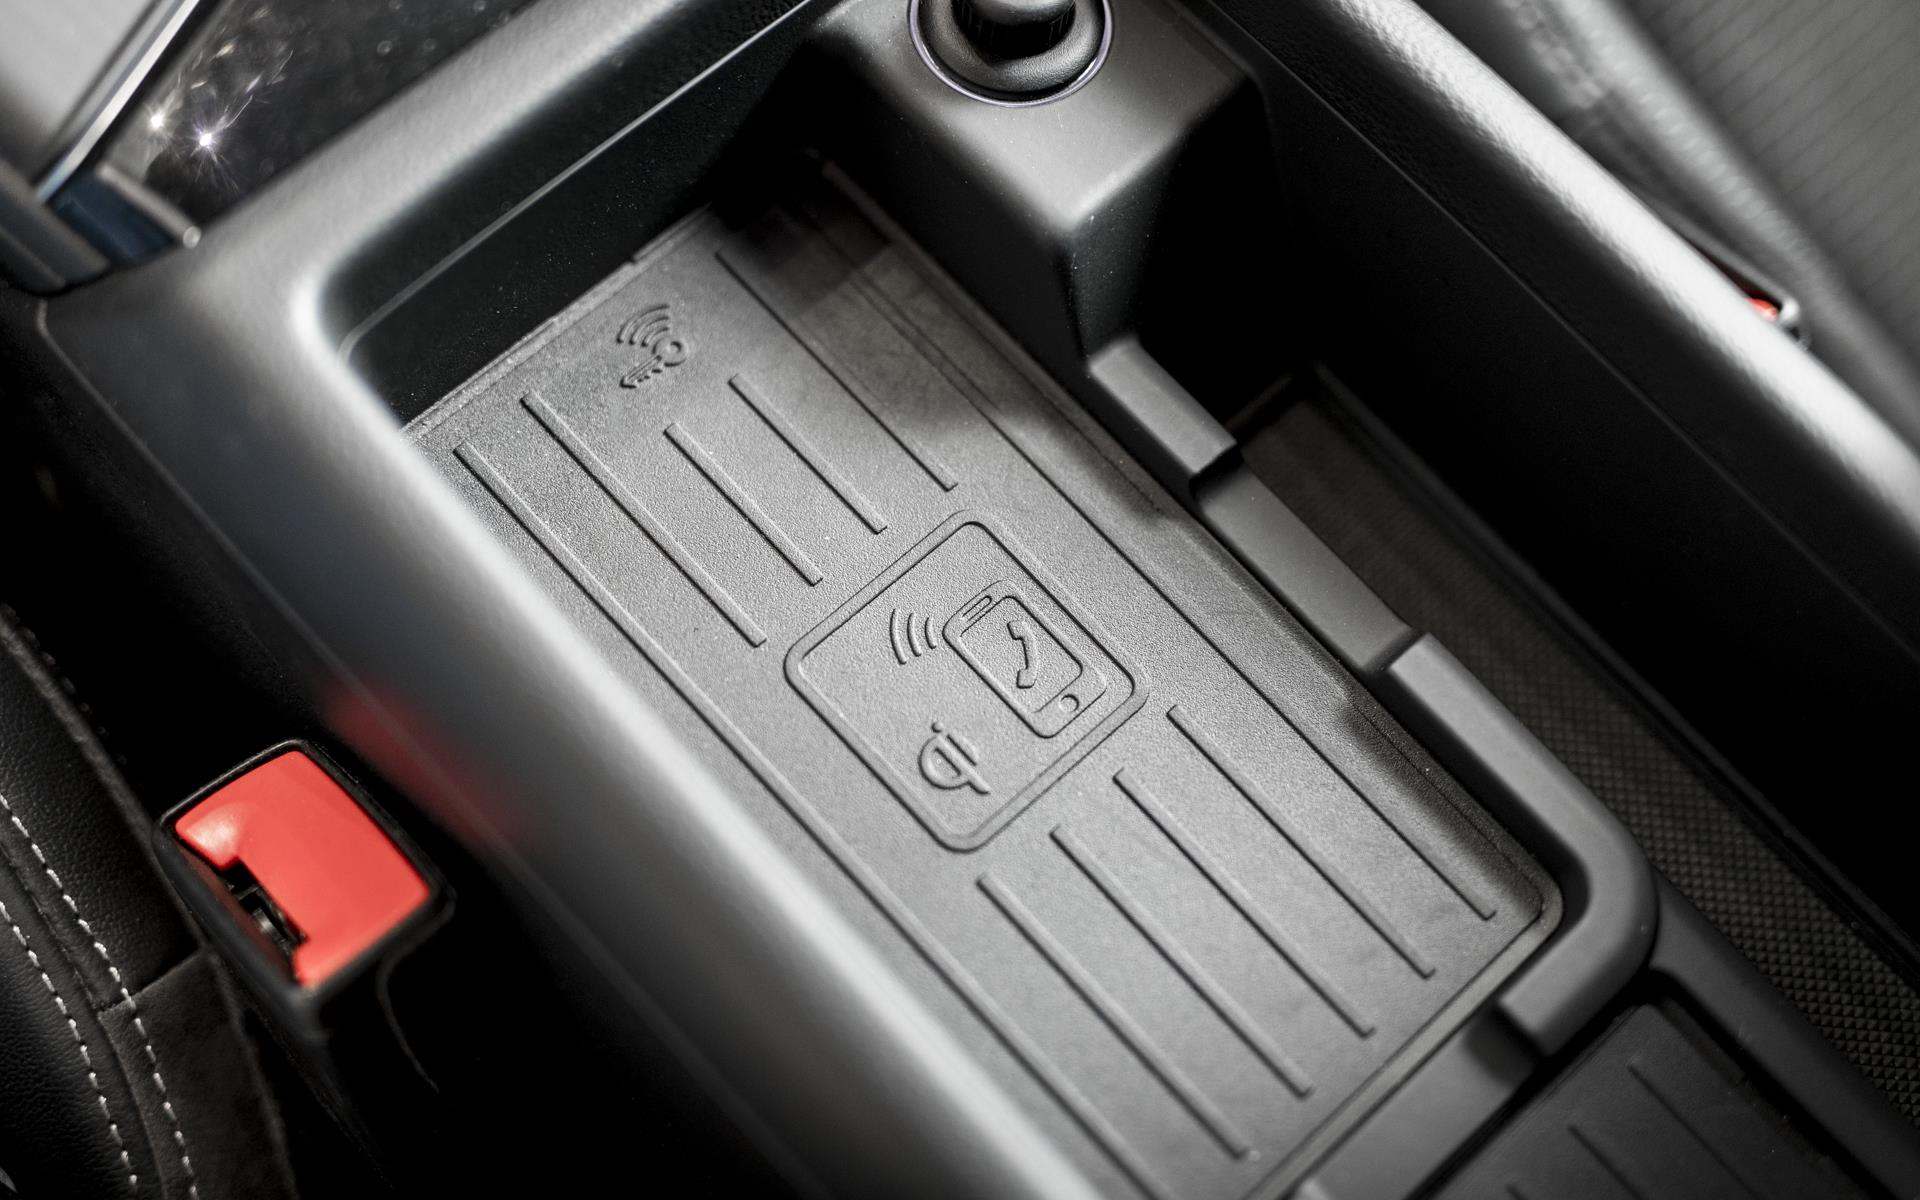 Avant 2,0 TDI S-Line Black Edition TipTronic 190HK Stc  image16